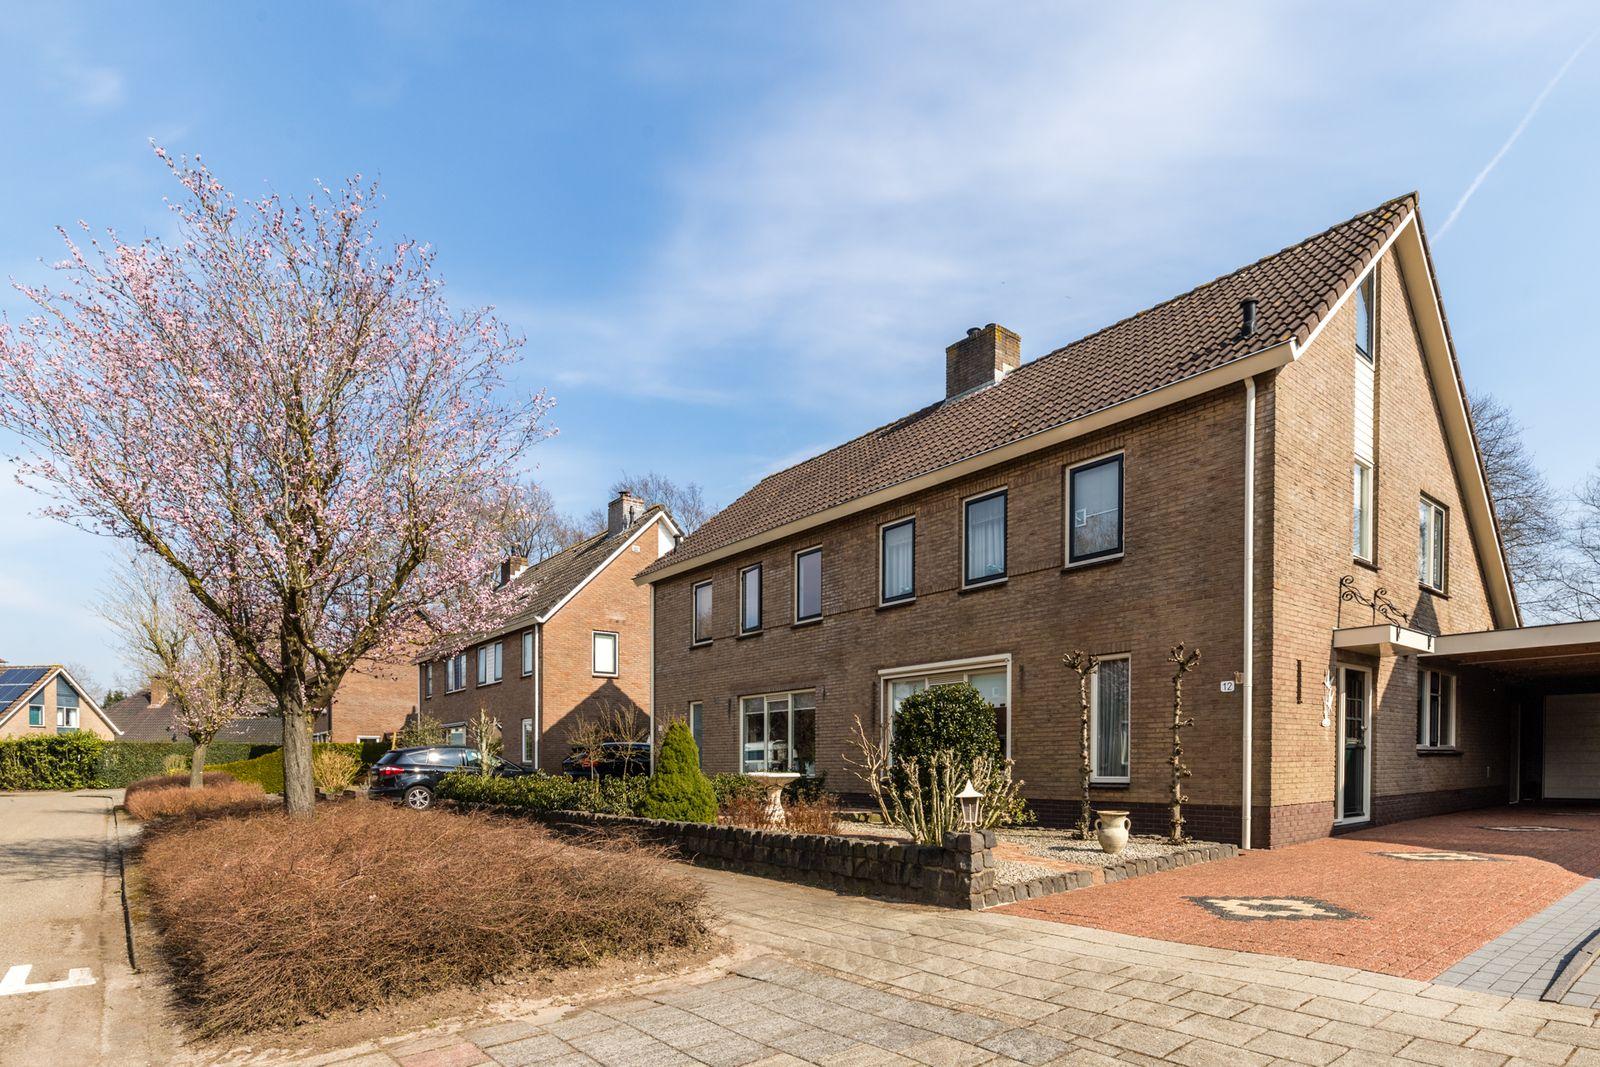 Ruysdaellaan 12, Nijkerk